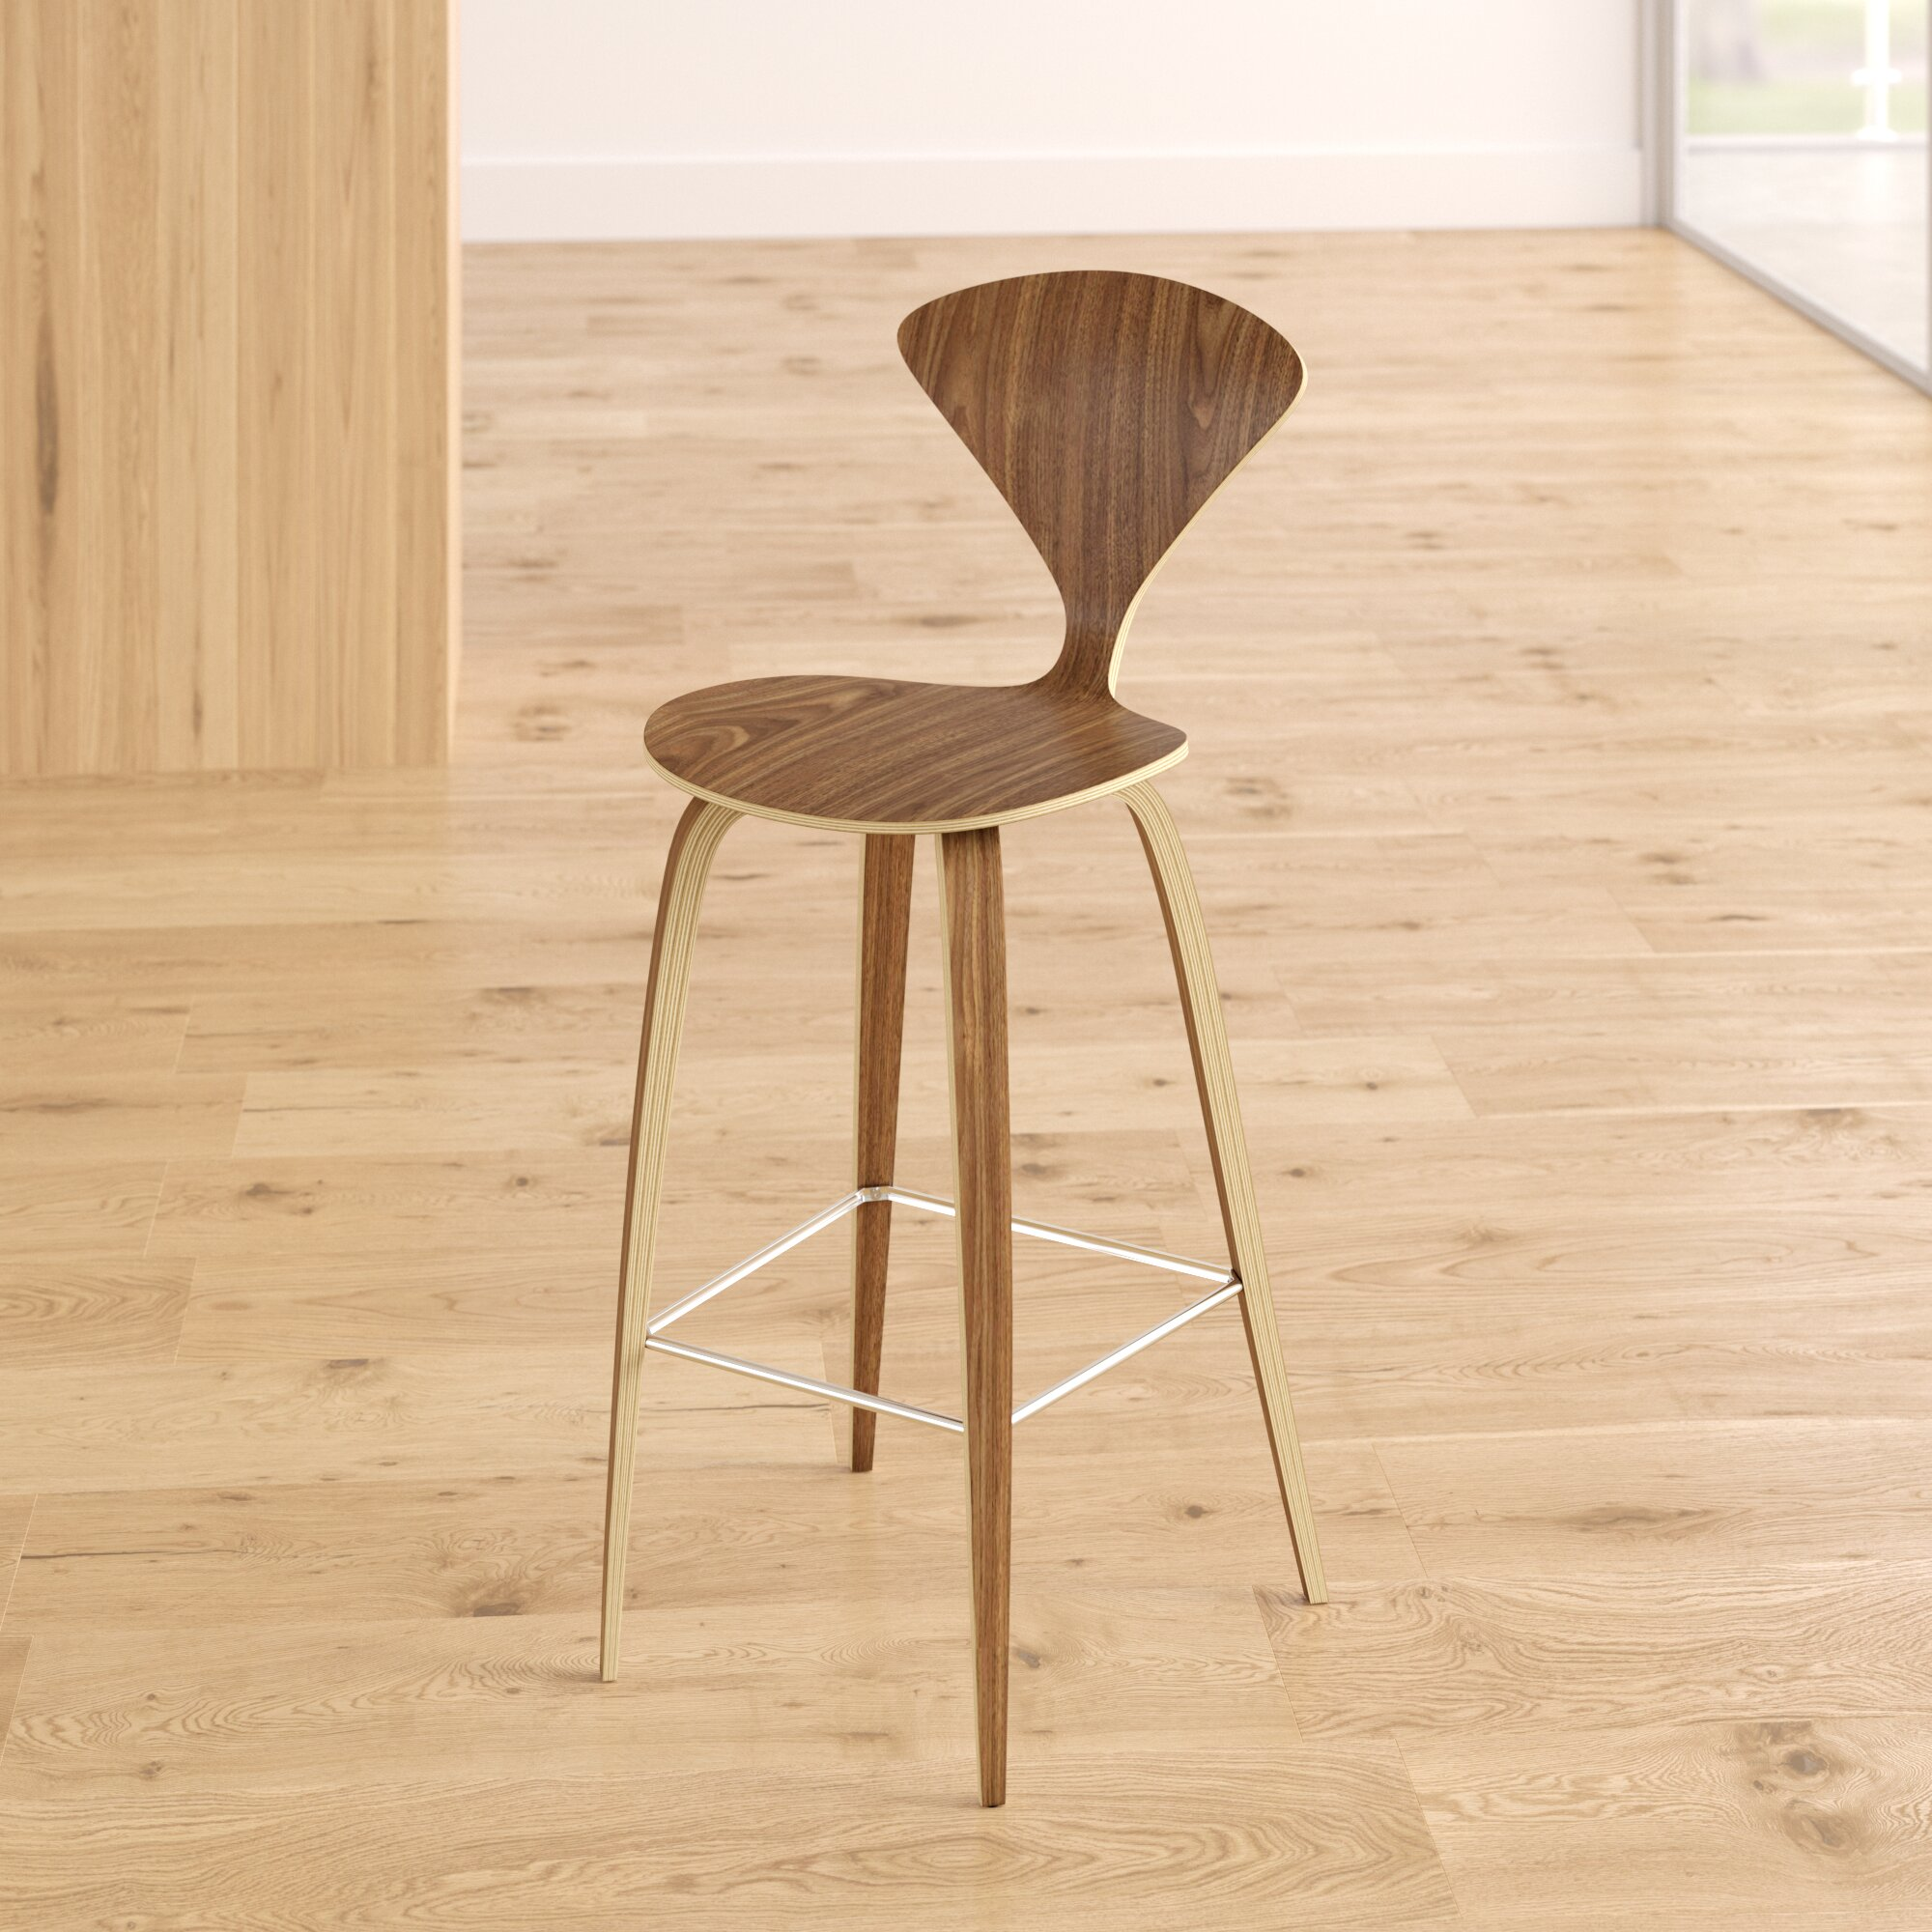 Peachy Olivia Bar Counter Stool Bralicious Painted Fabric Chair Ideas Braliciousco